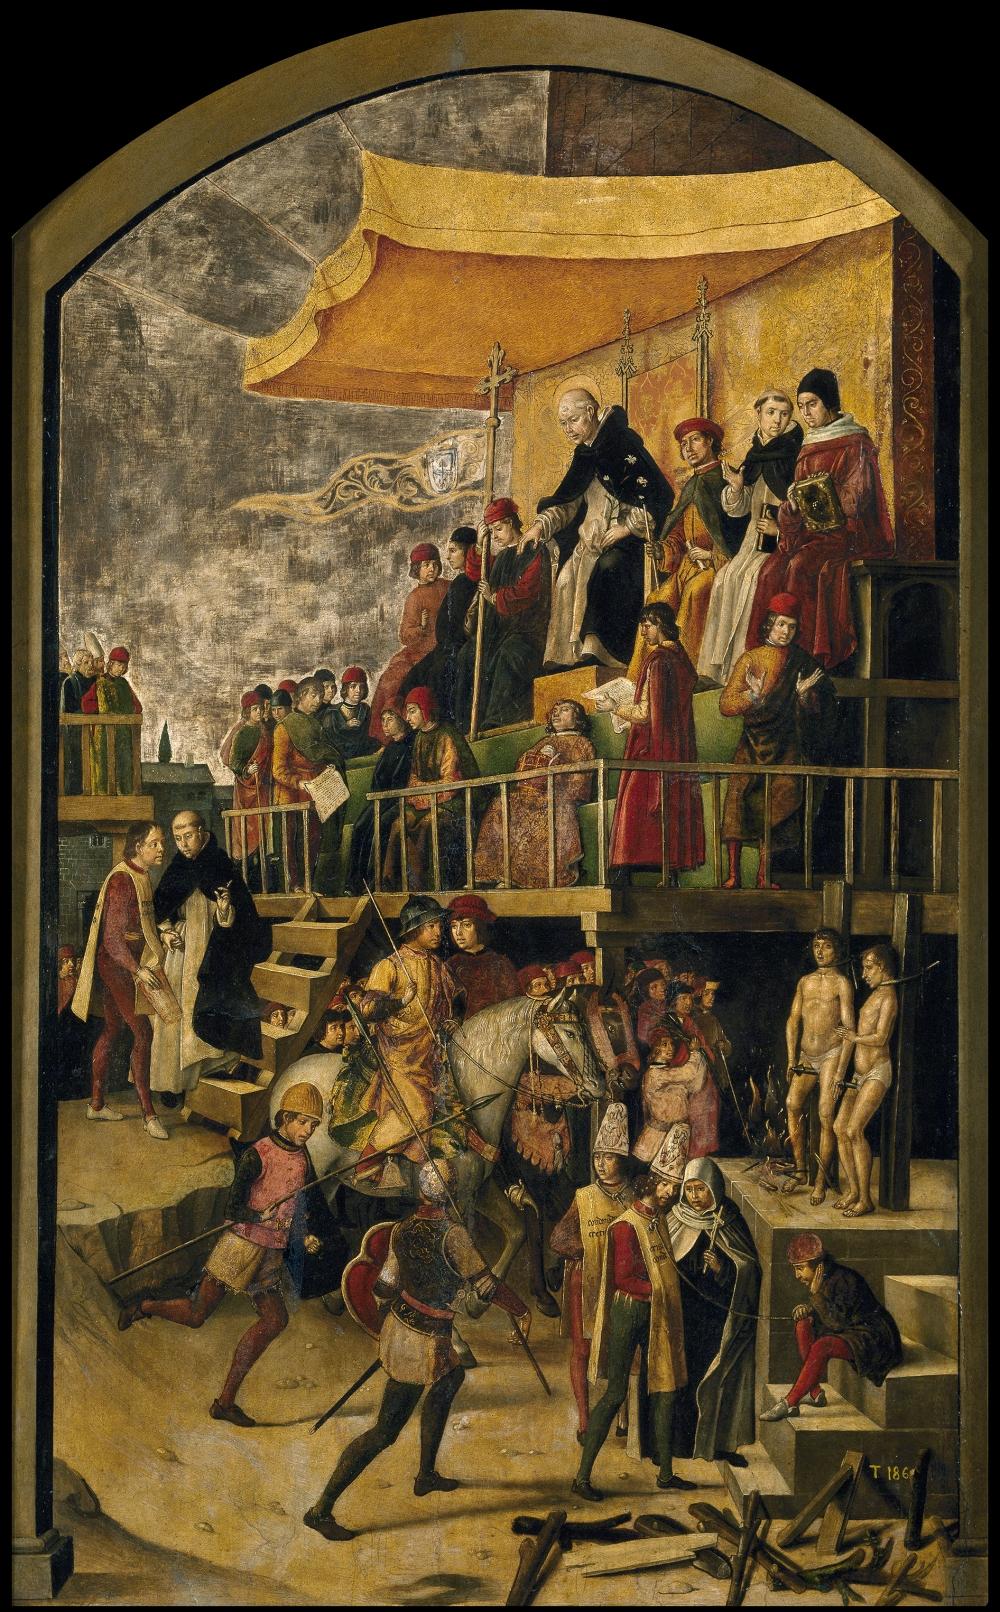 pedro_berruguete_saint_dominic_presiding_over_an_auto-da-fe_1495